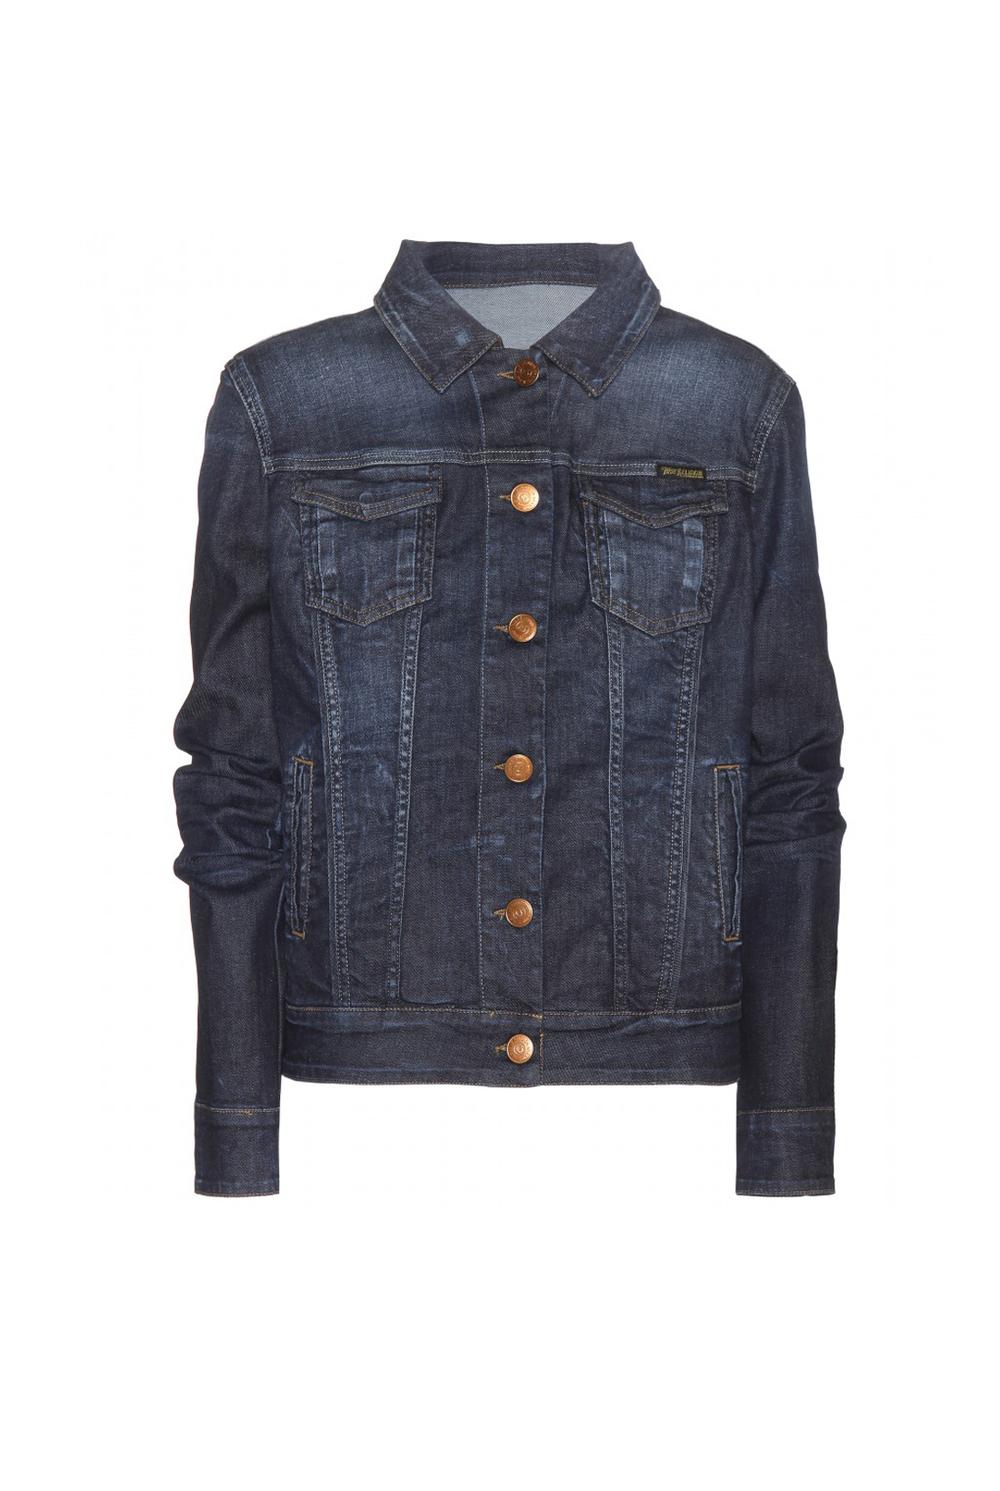 08-spring-denim-trends-shrunken-jackets-05.jpg